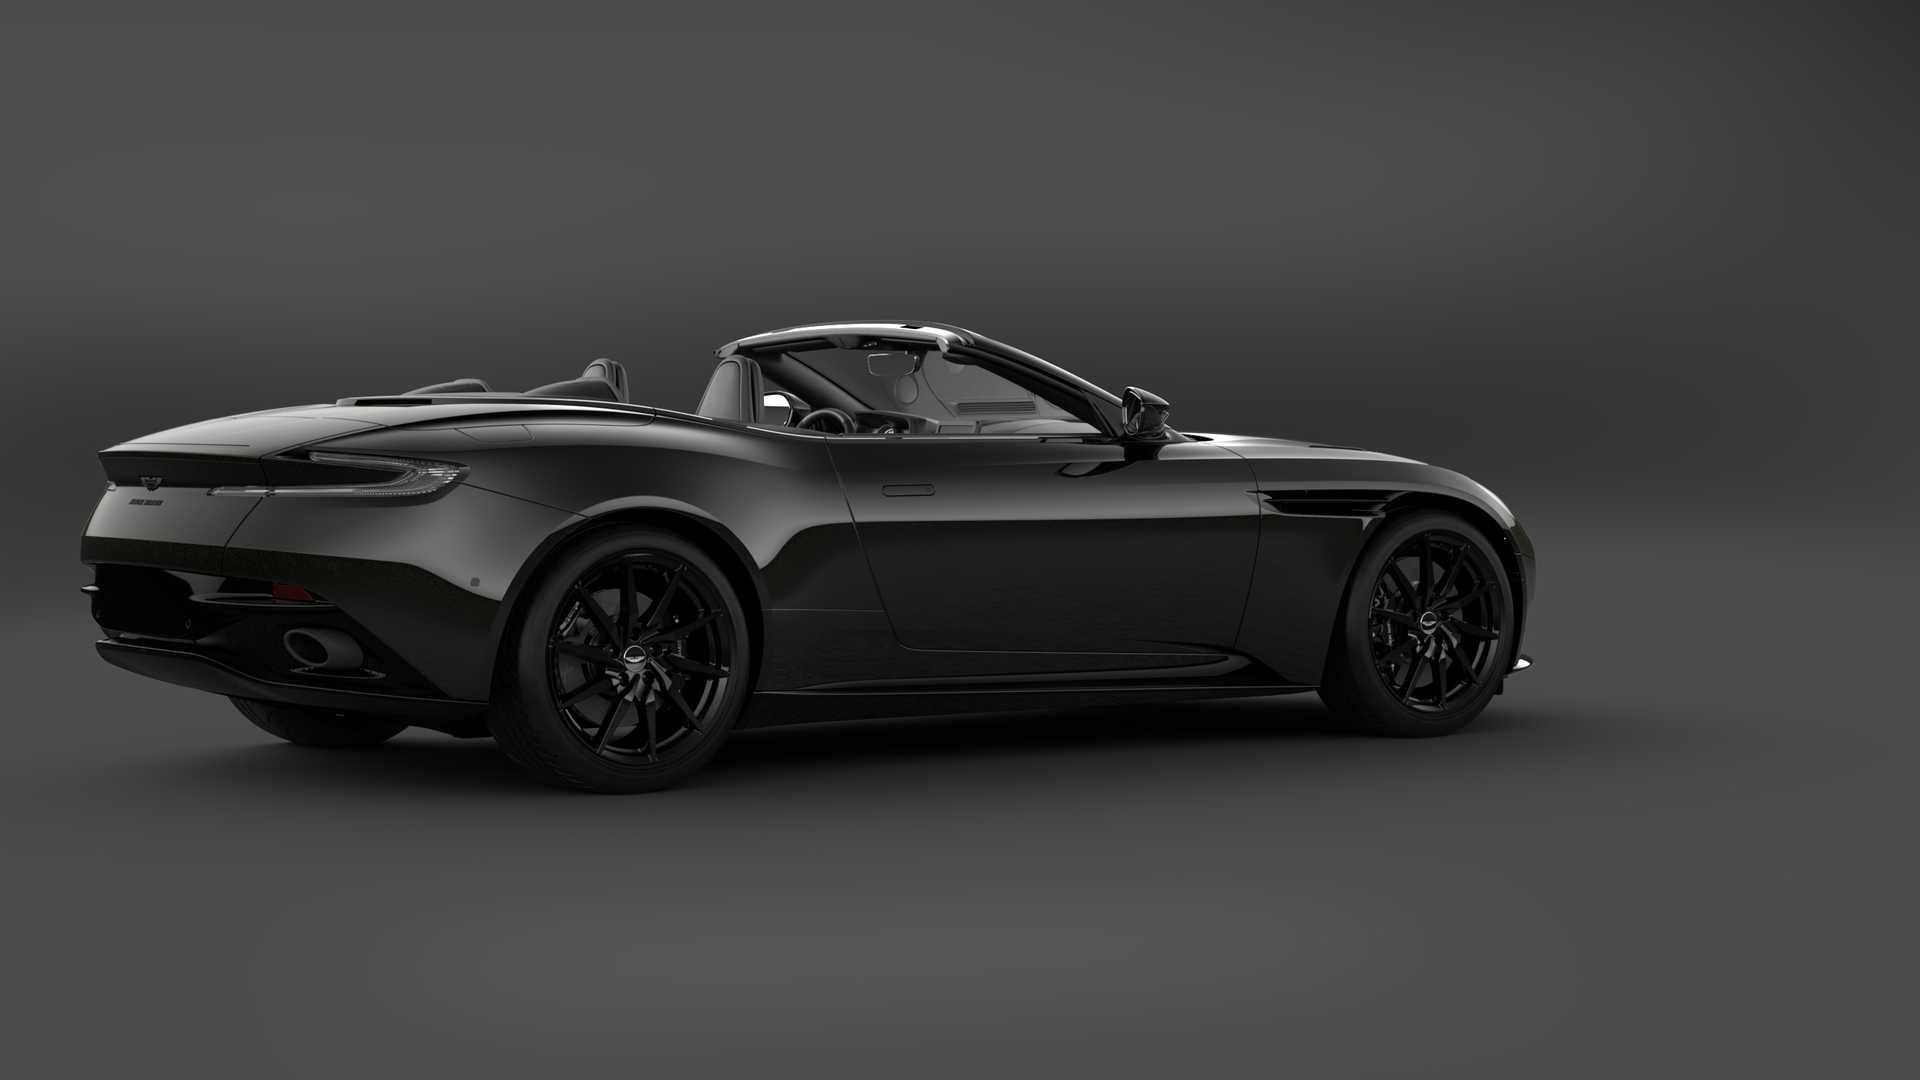 Aston-Martin-DB11-V8-Shadow-Edition-8